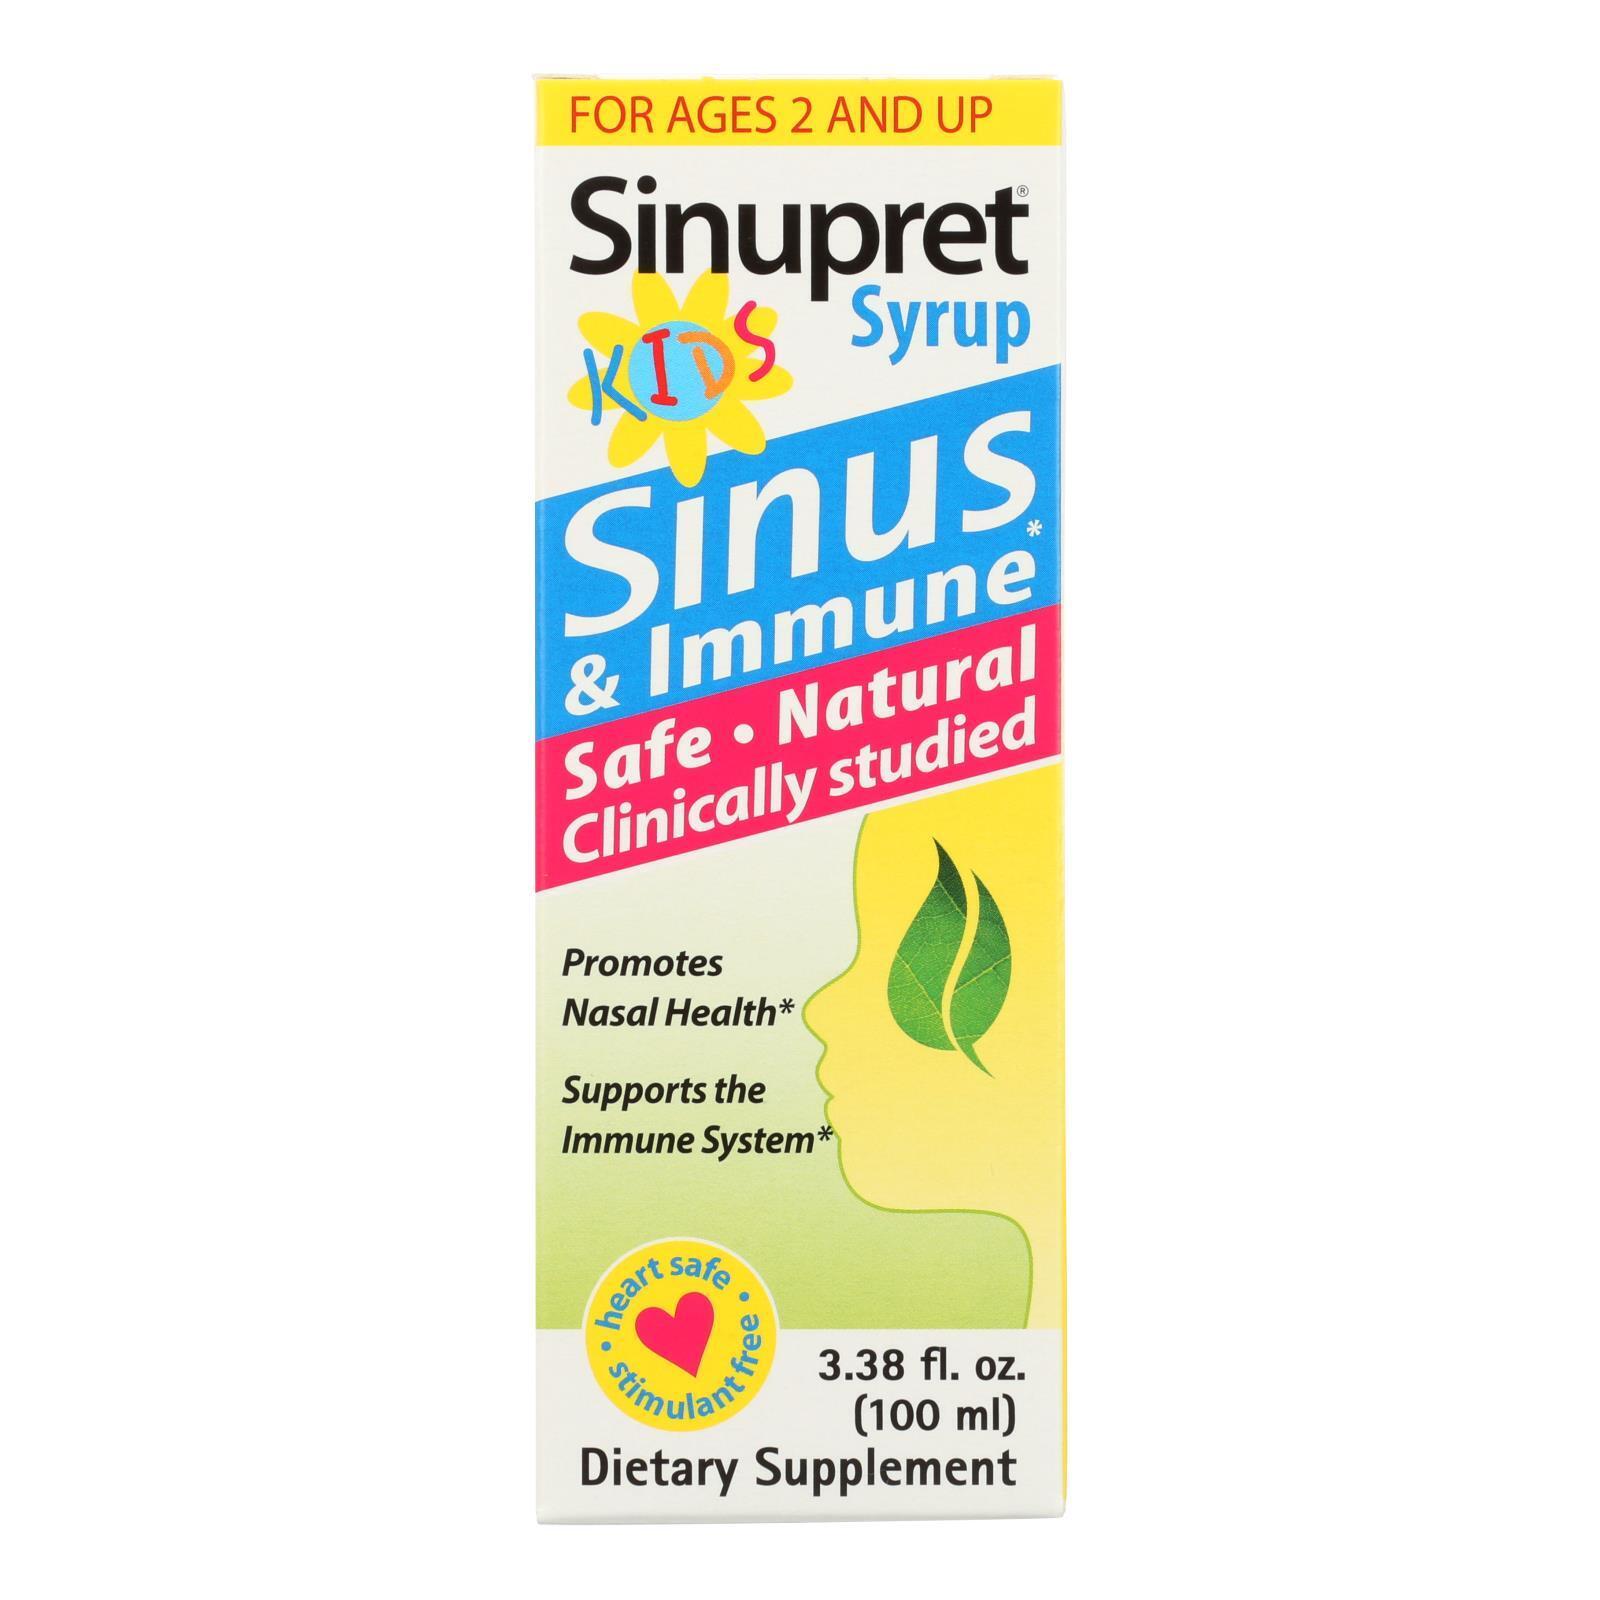 Sinupret Kids Syrup - 3.38 fl oz